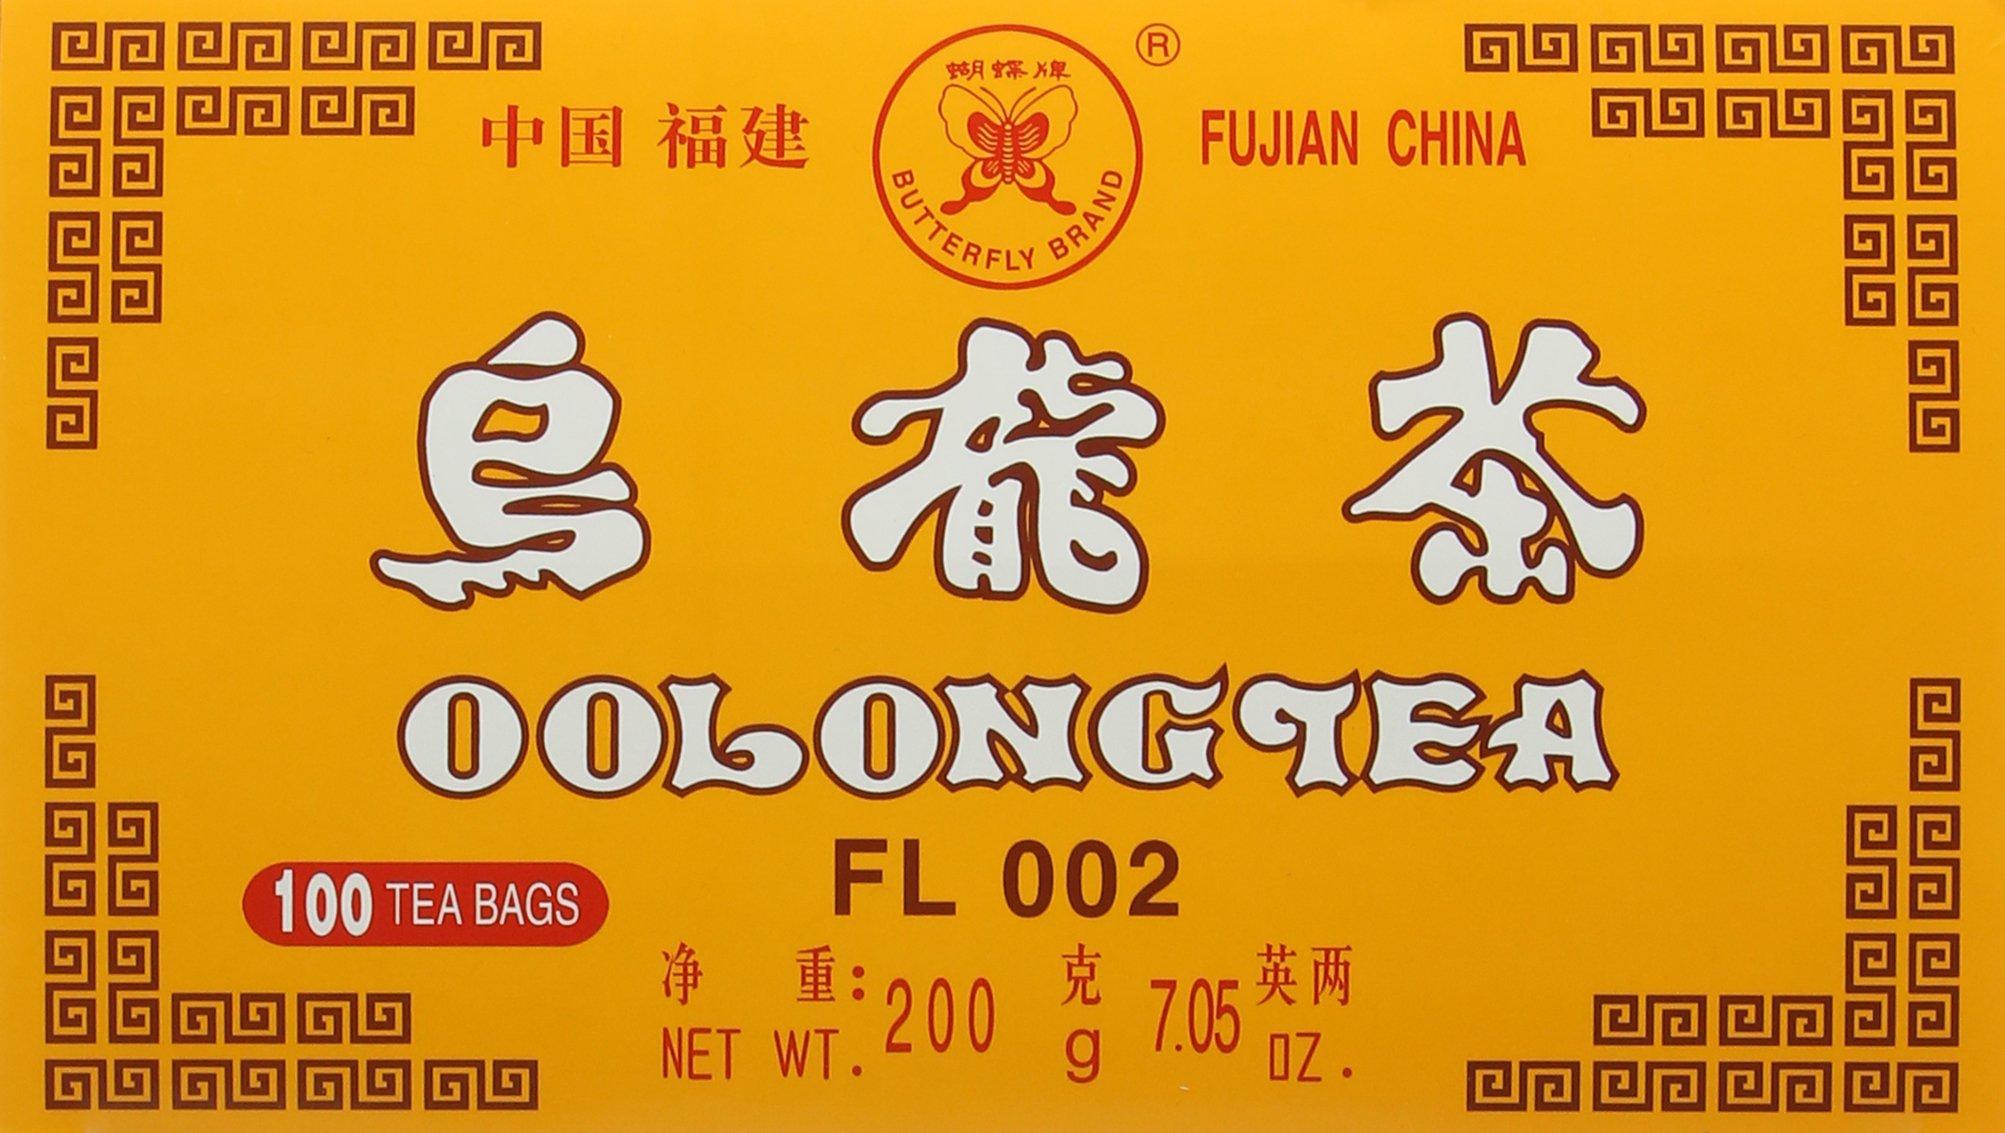 Butterfly Brand Oolong Tea 100 Bags